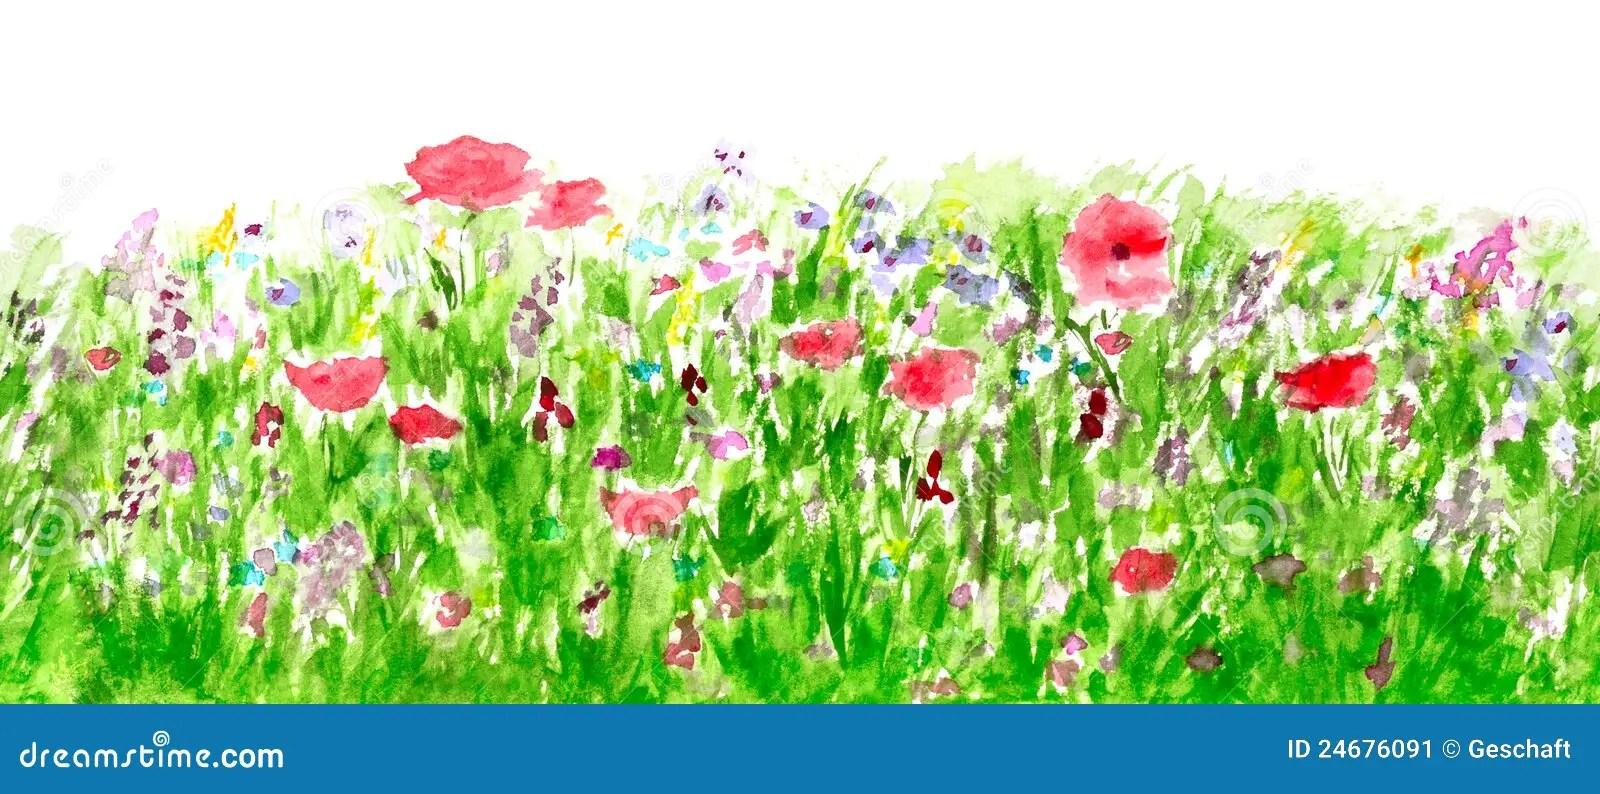 Corner Watercolor Floral Border